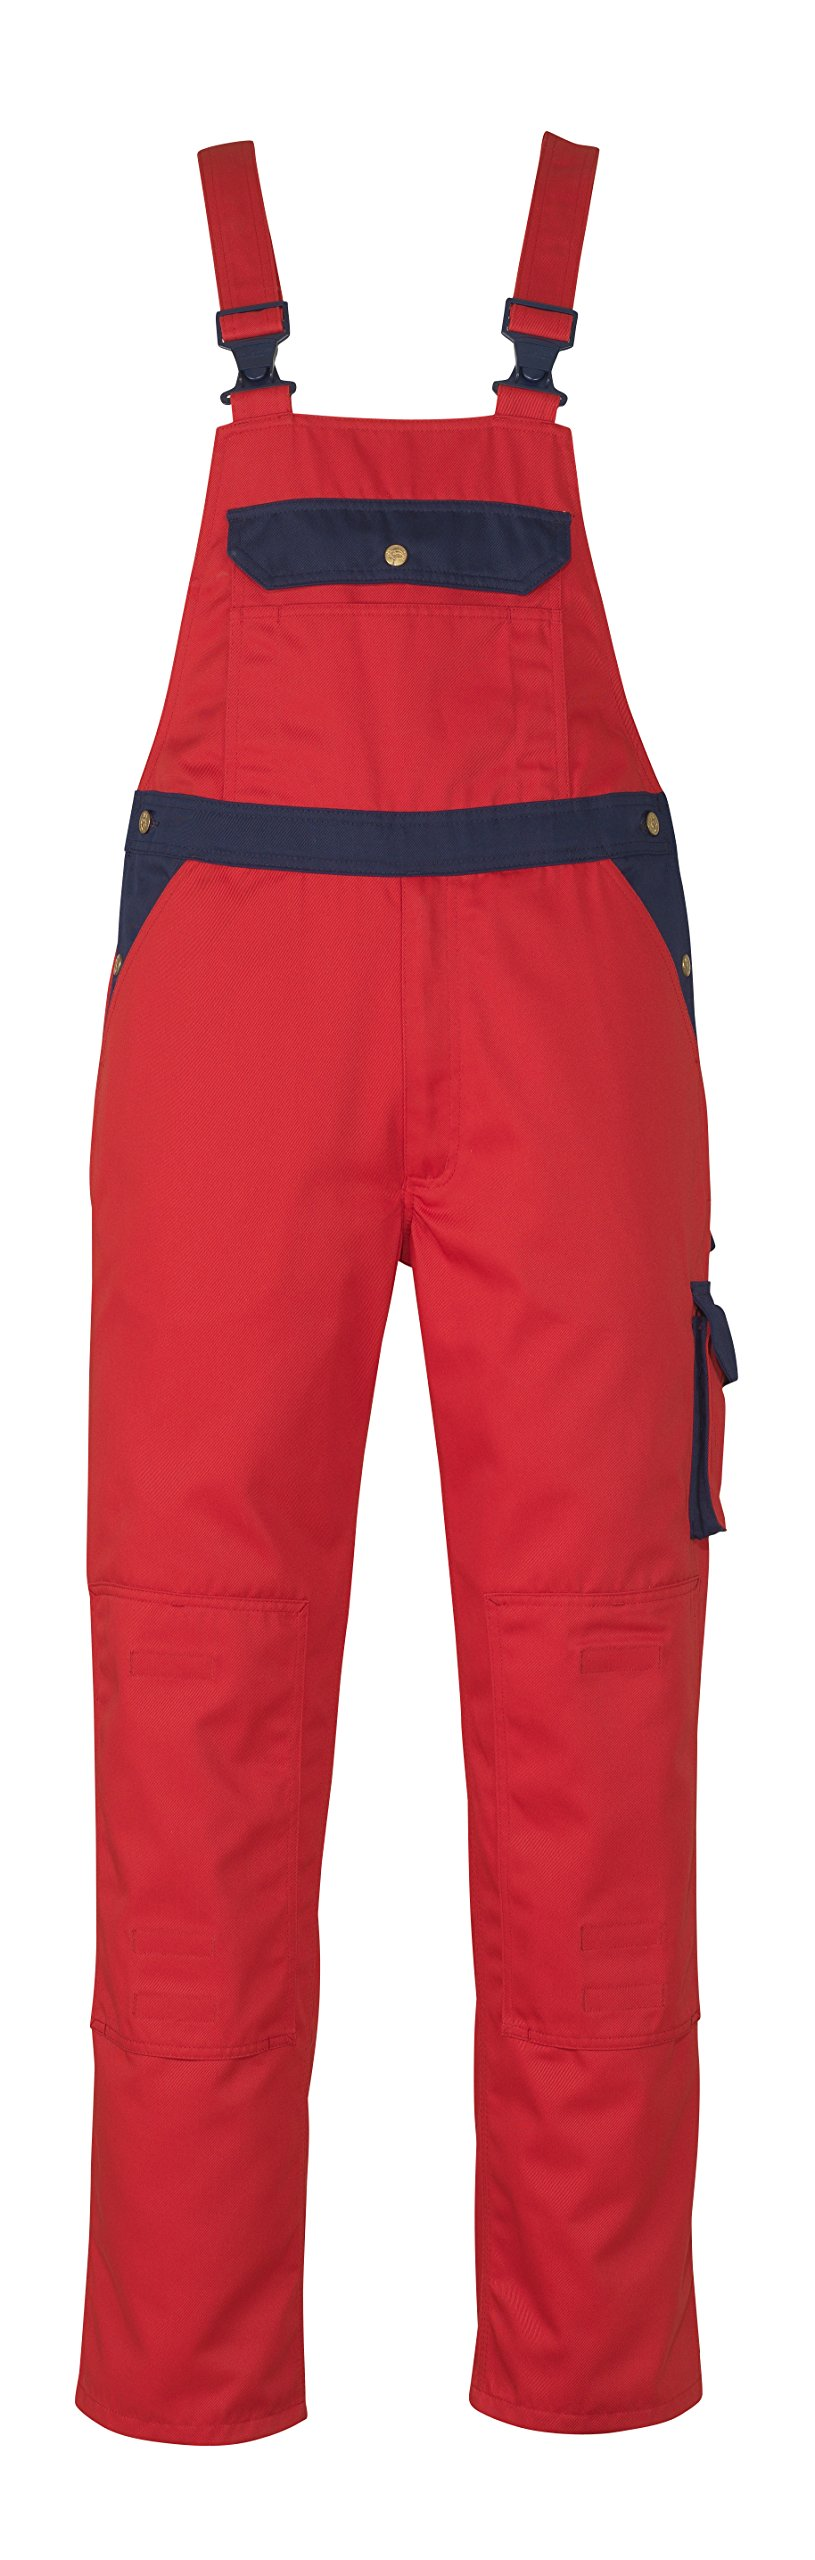 Mascot 00969-430-21-82C66''Milano'' Bib & Brace, L82cm/C66, Red/marine Blue